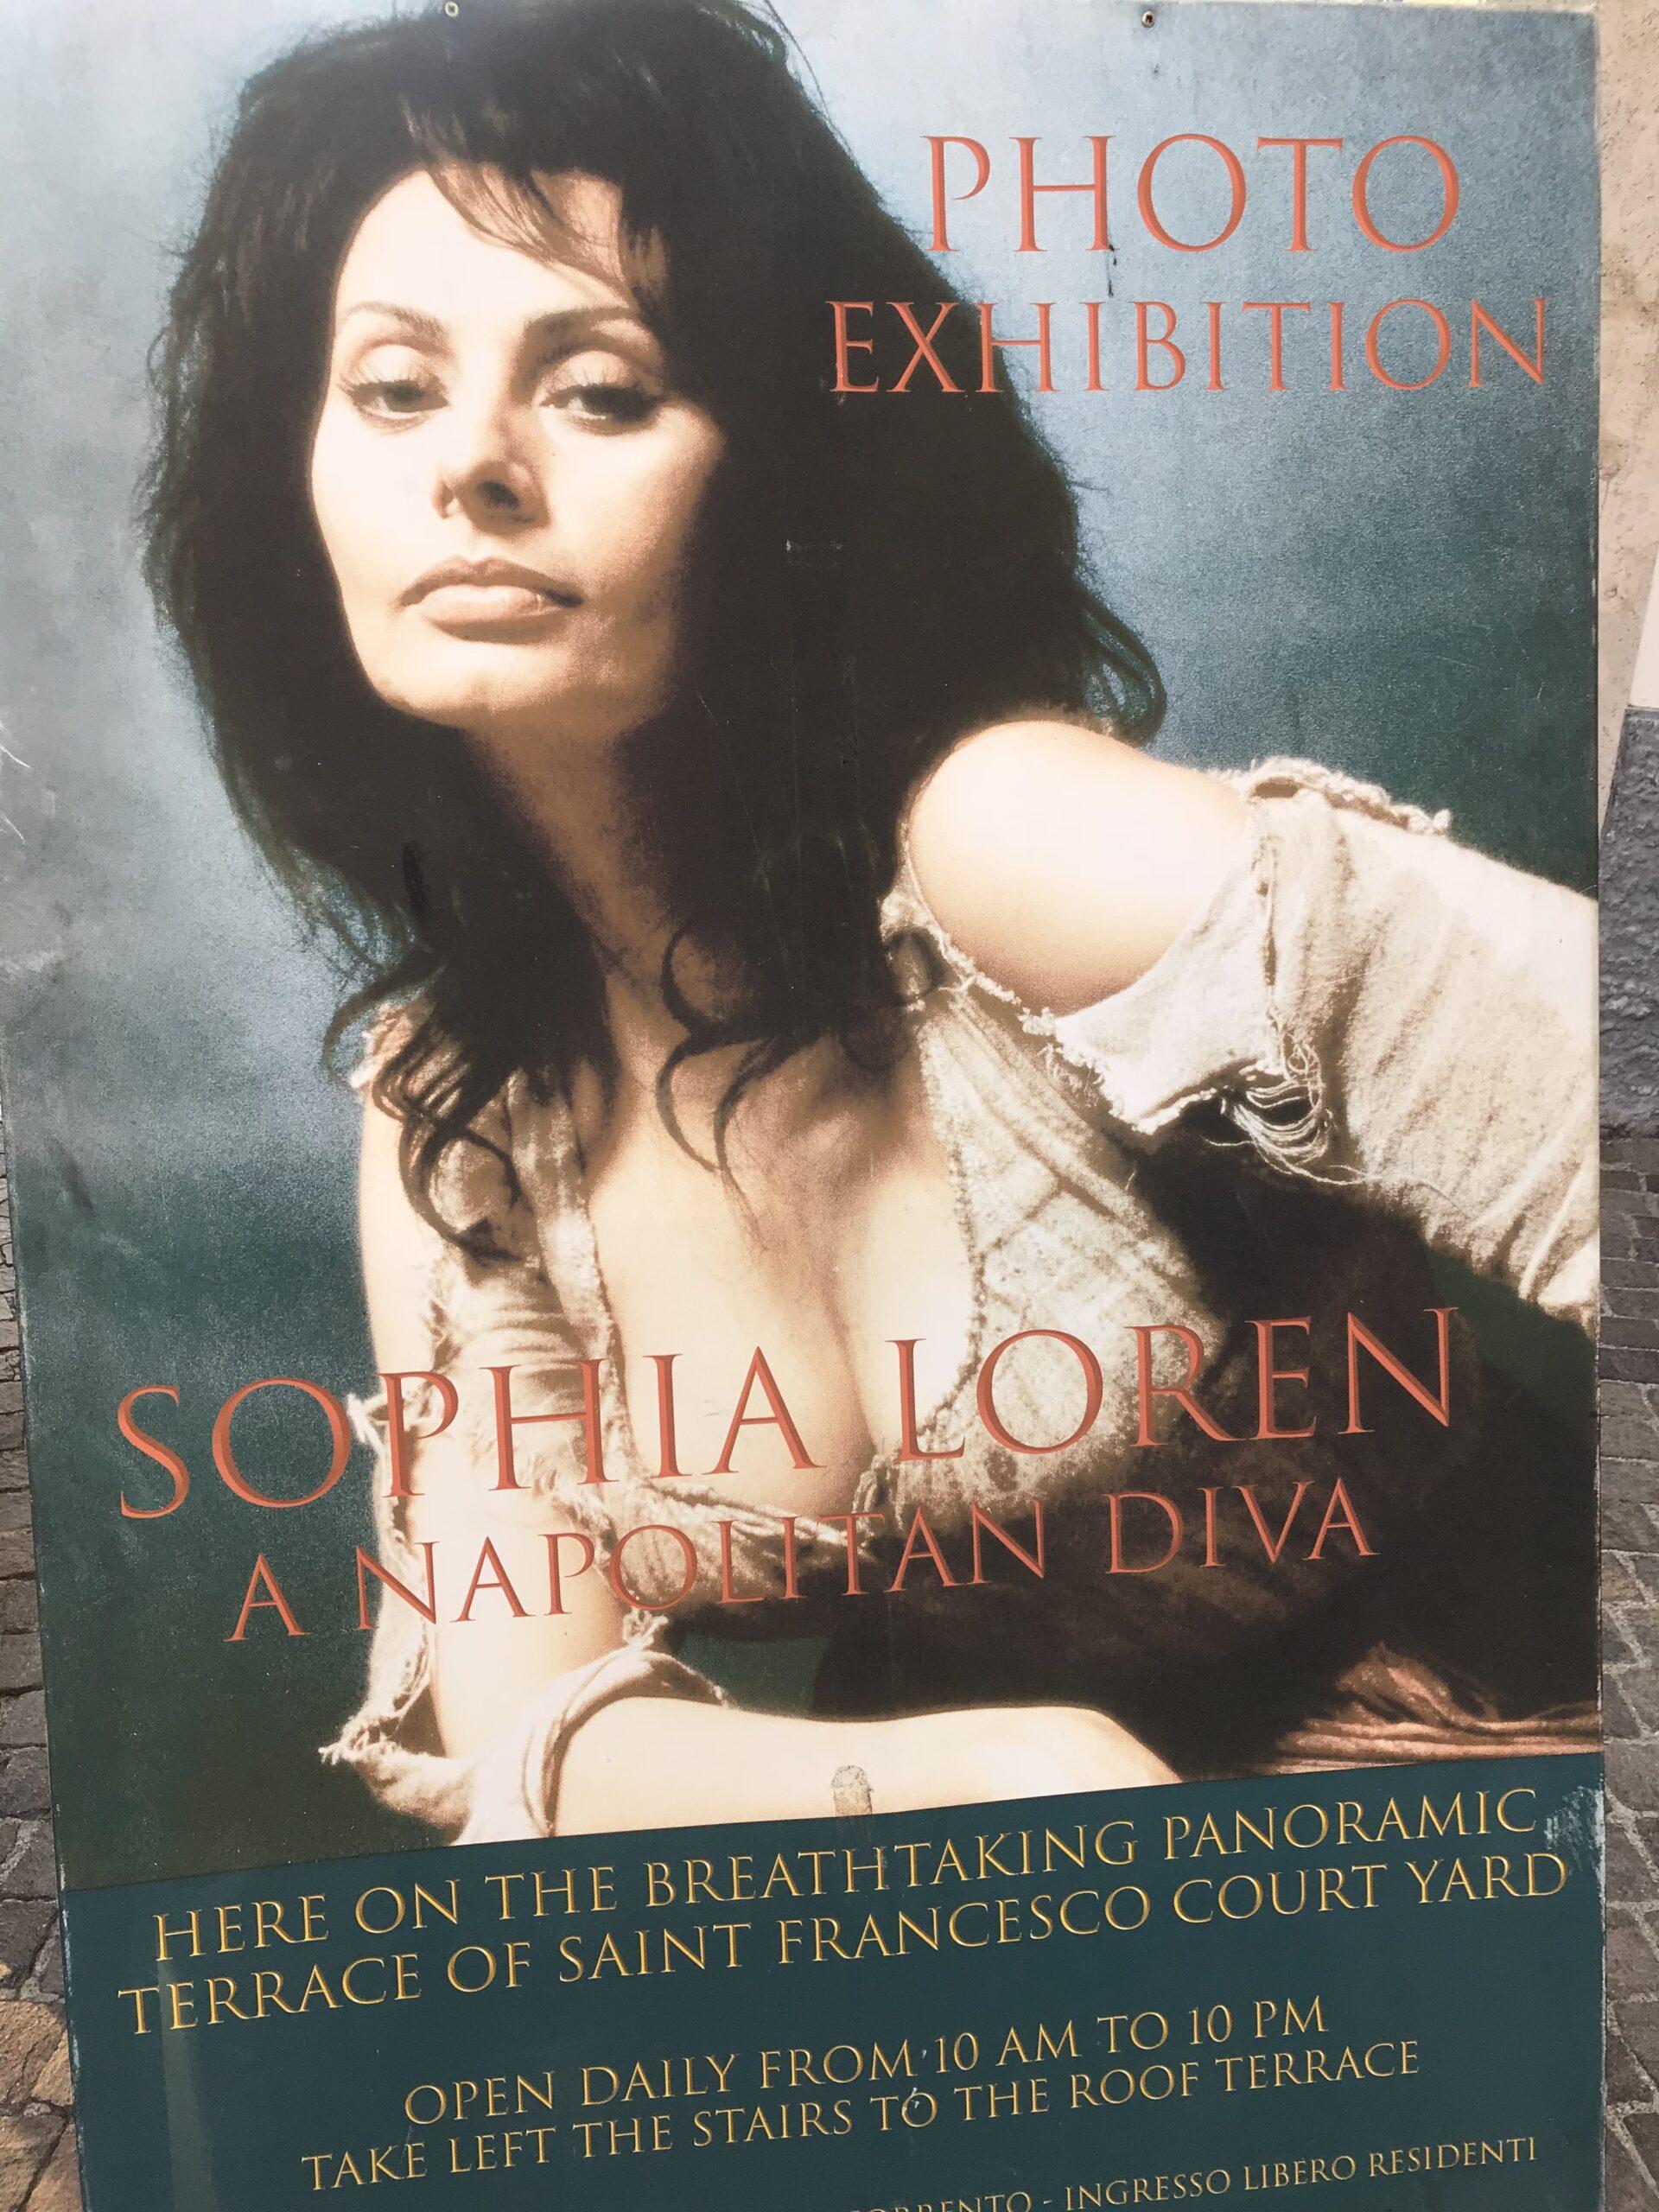 Sophia Loren, vita da grande diva in photo exibition